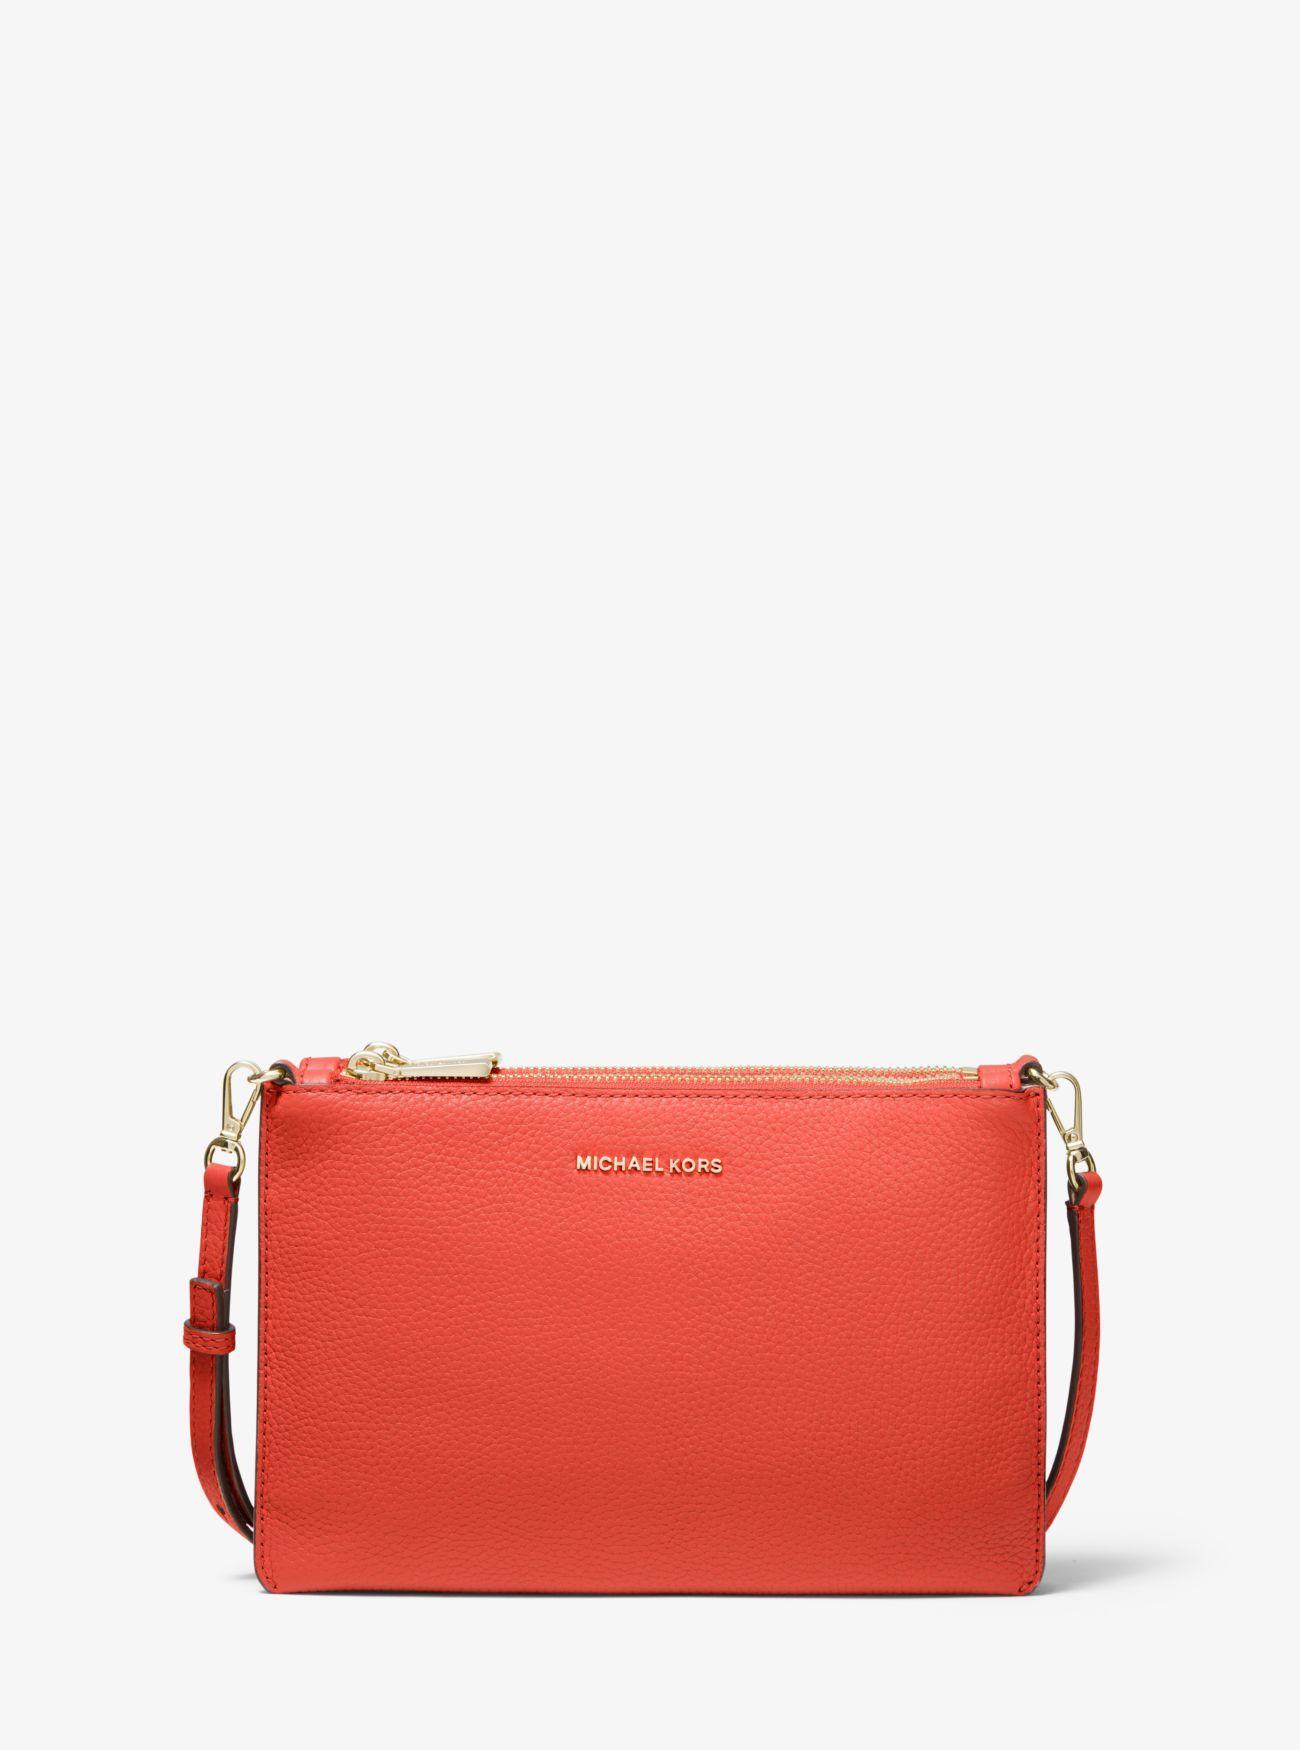 cbdc626baabb Lyst - MICHAEL Michael Kors Adele Pebbled Leather Crossbody Bag in Pink